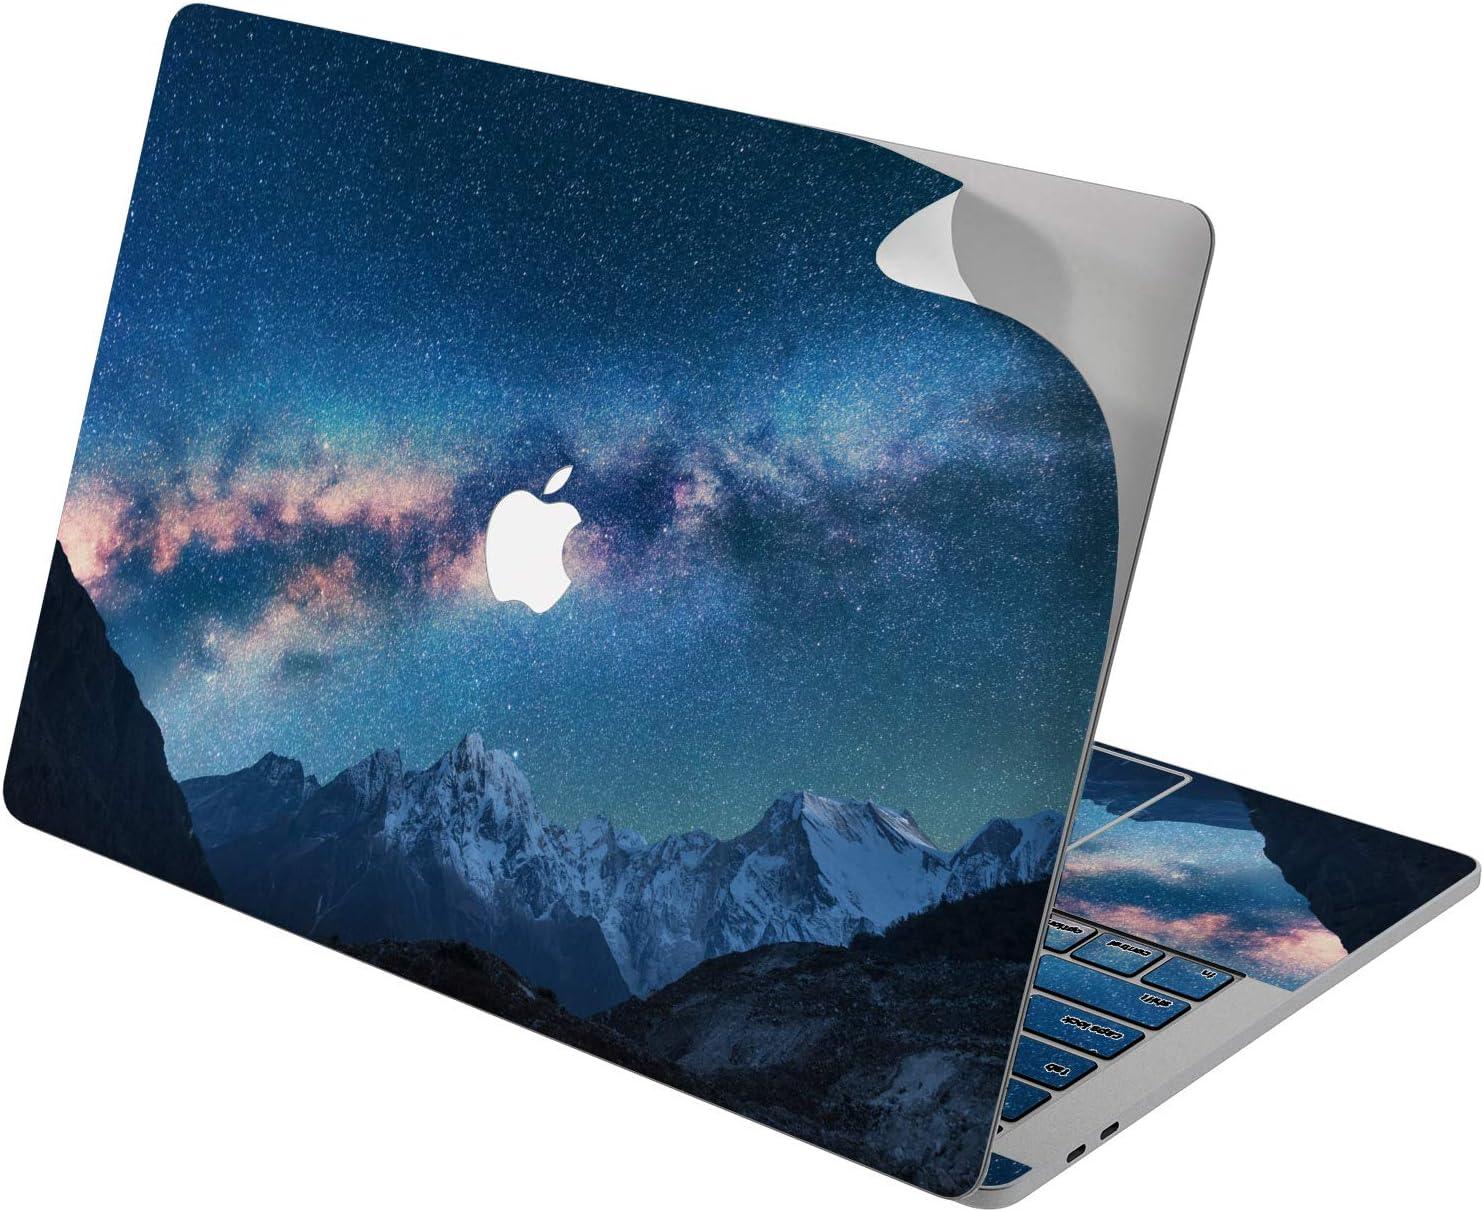 "Cavka Vinyl Decal Skin for Apple MacBook Pro 13"" 2019 15"" 2018 Air 13"" 2020 Retina 2015 Mac 11"" Mac 12"" Cover Range Stars Design Sticker Sky Night Protective Scenic Space Mountain Galaxy Print Laptop"